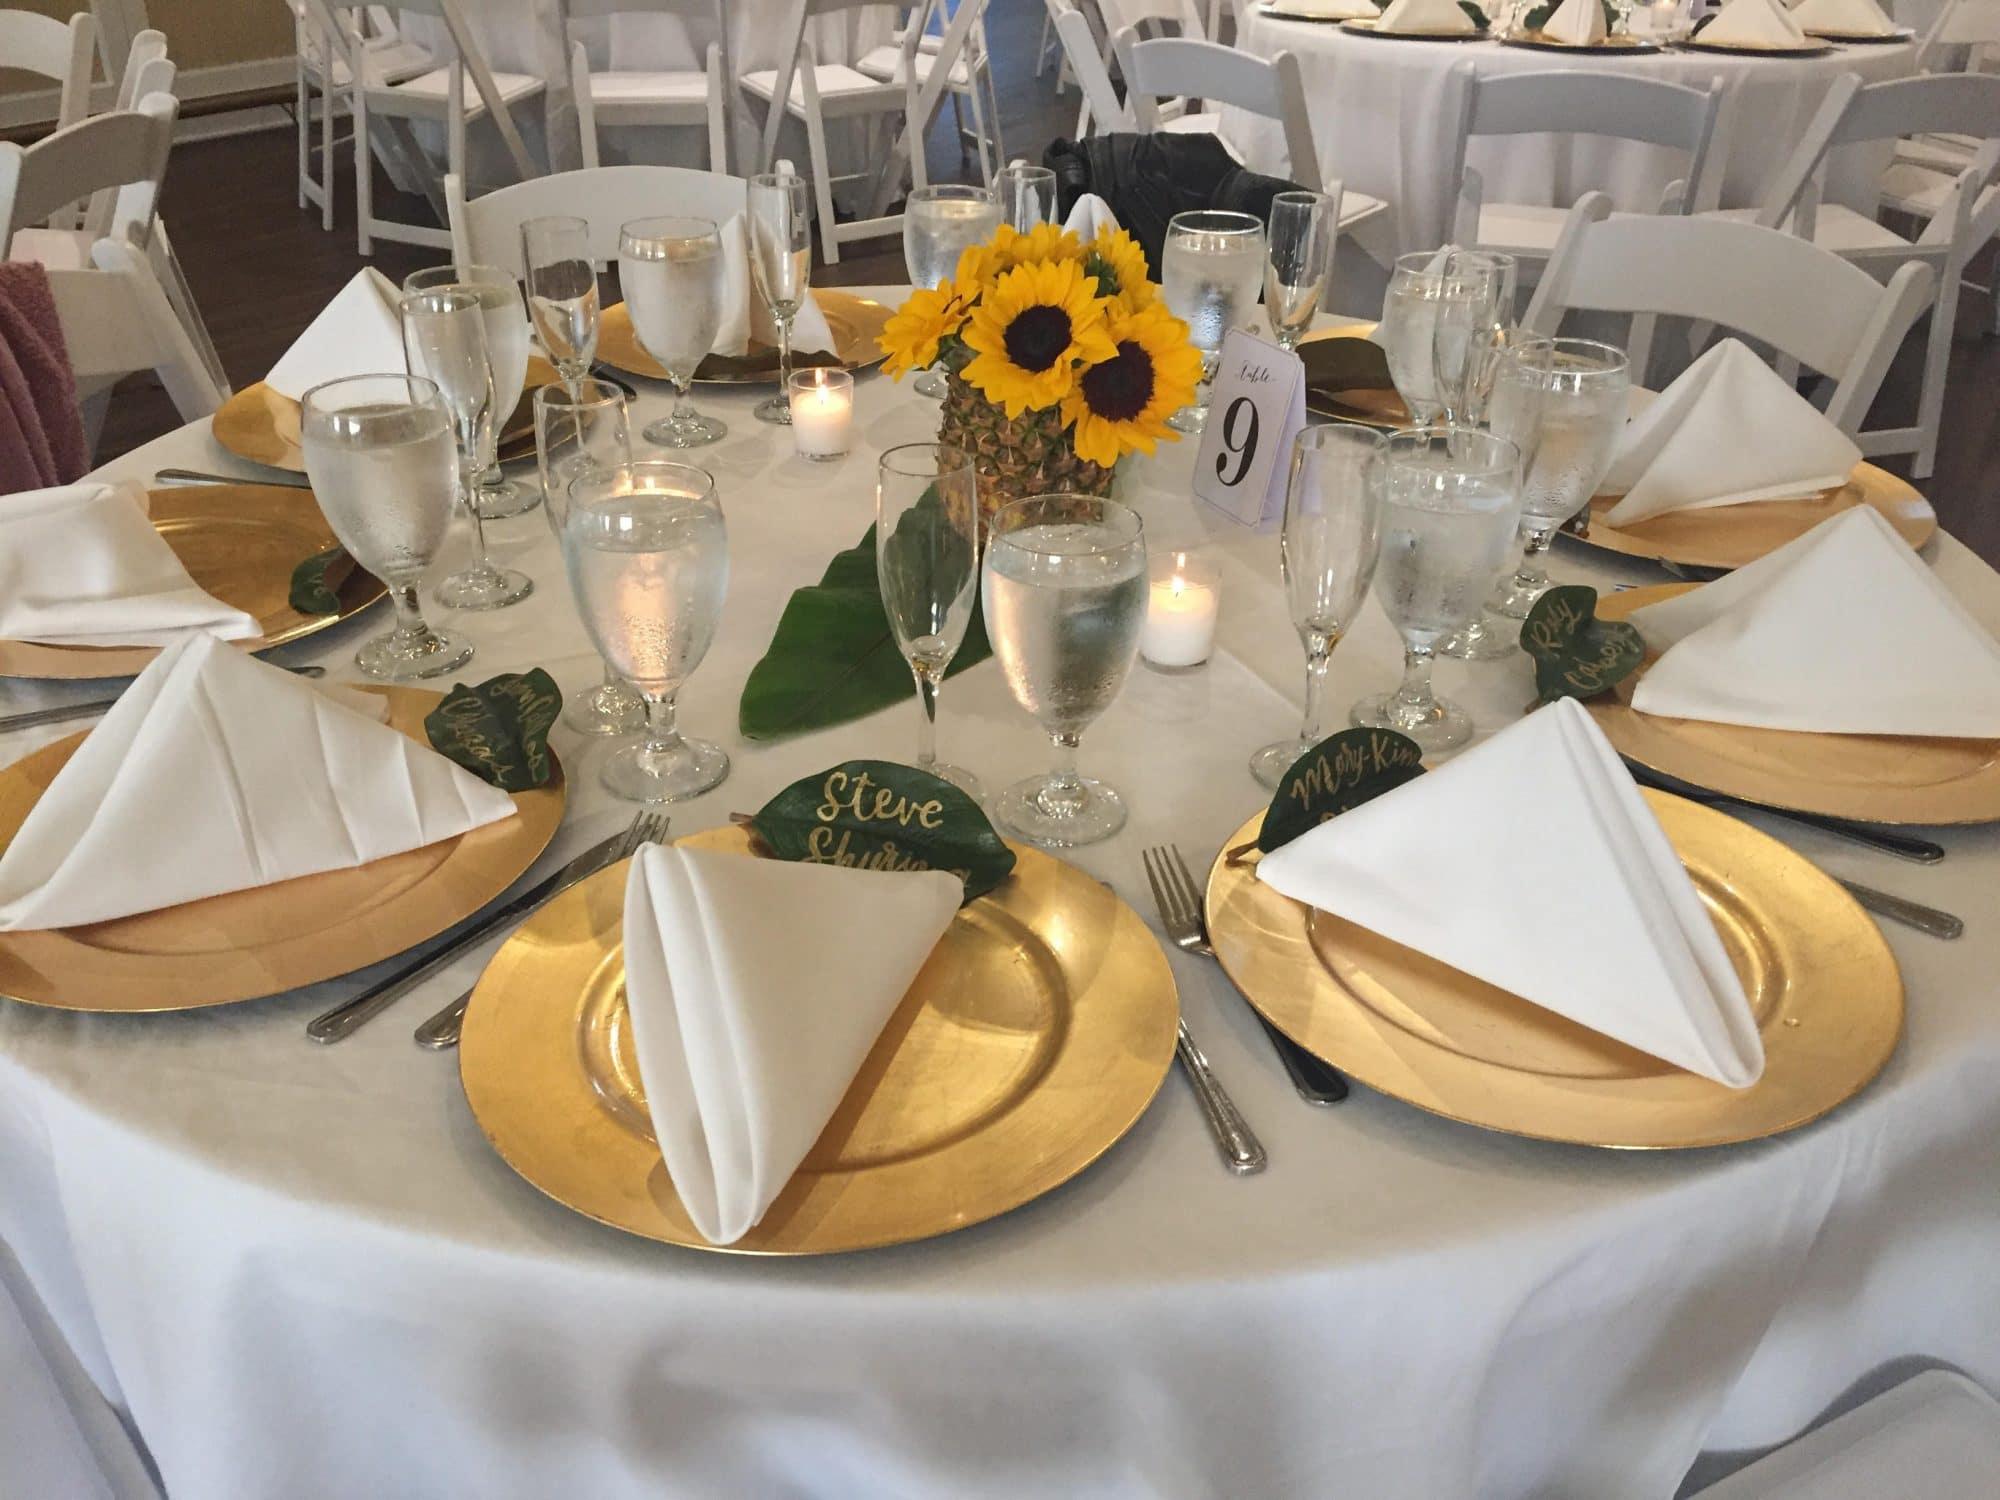 Celebration Golf Club - reception table with sunflower centerpiece